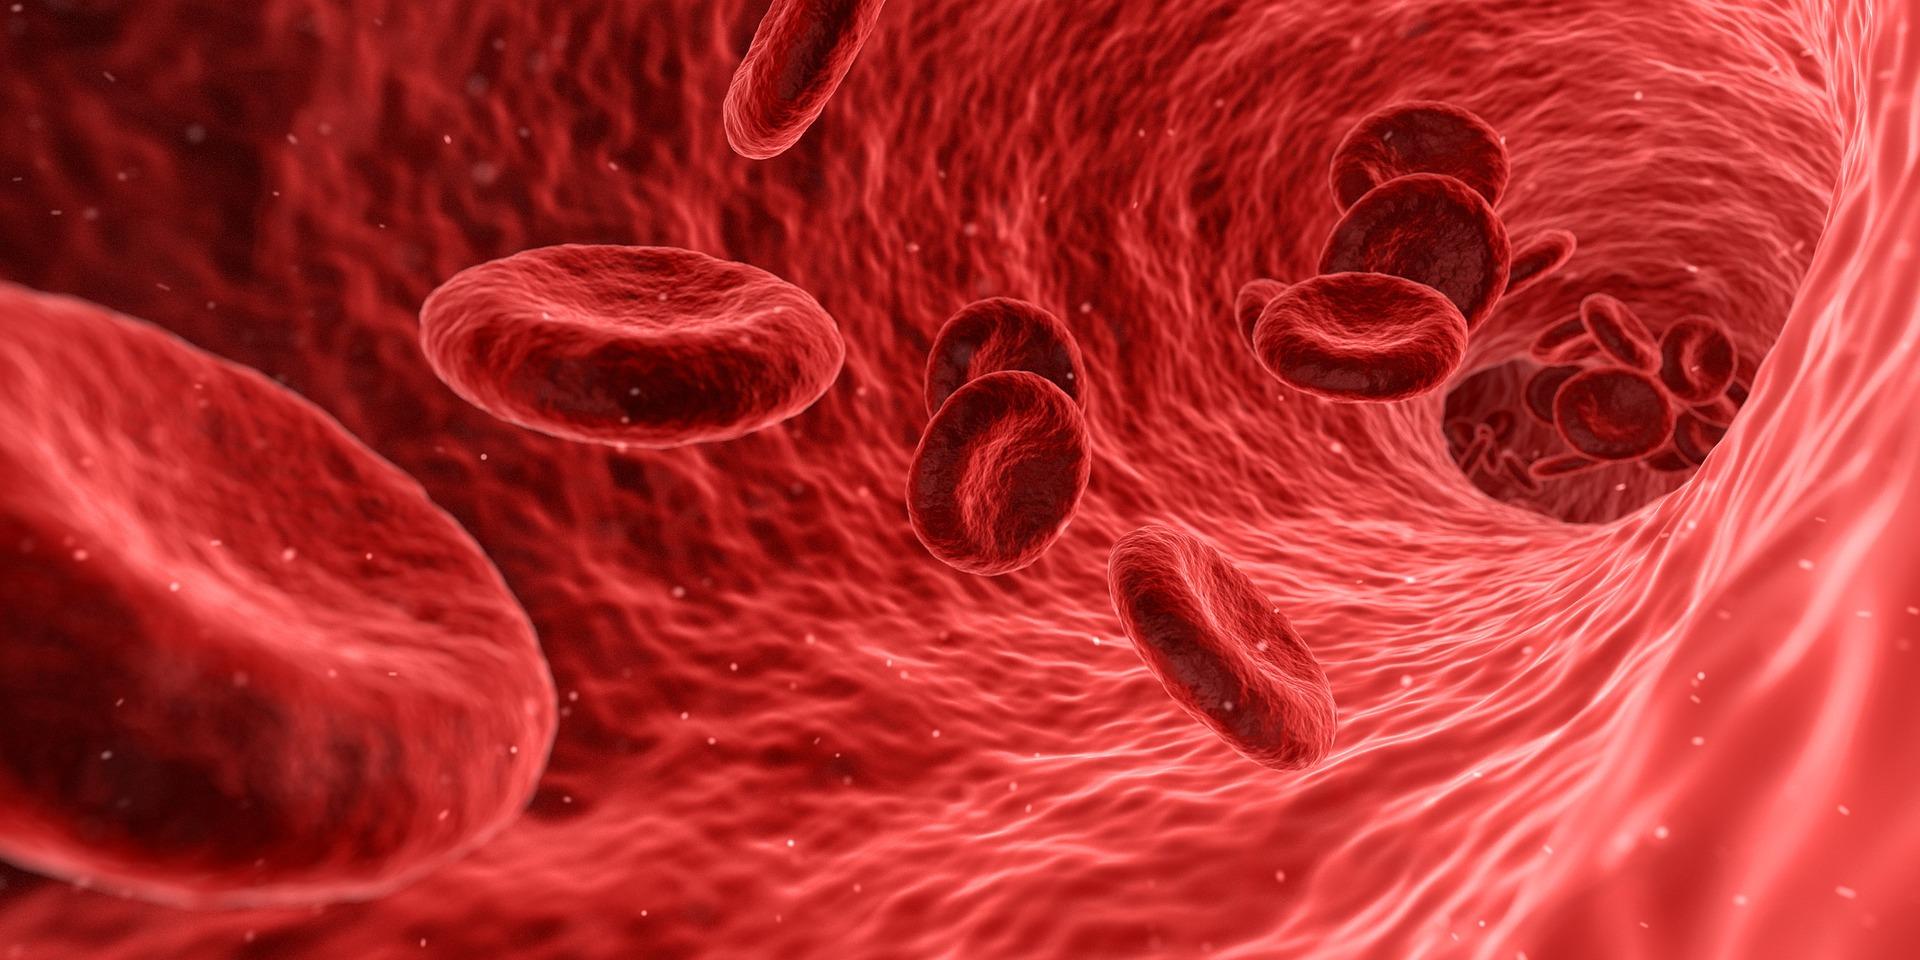 Hematólogos se actualizan sobre síndromes mieloproliferativos crónicos